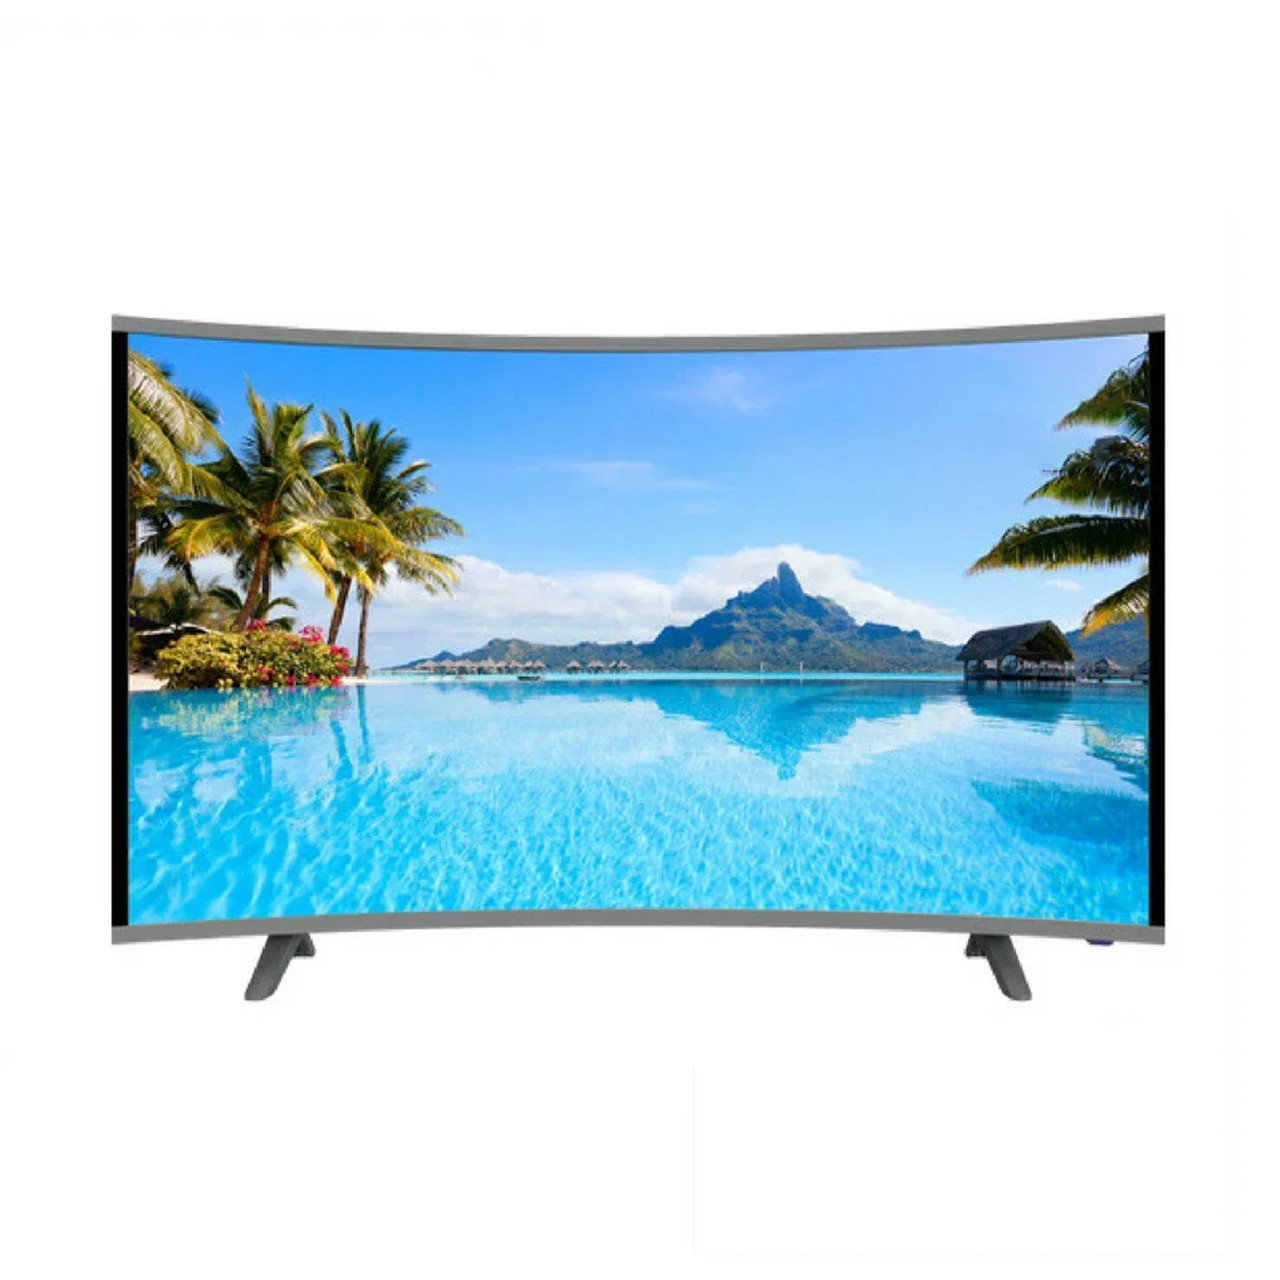 "Телевизор COMER 50"" Smart 4K (Android 7.1 (1/4) Изогнутый ( Смарт телевизор Комер 50 Андроид)"